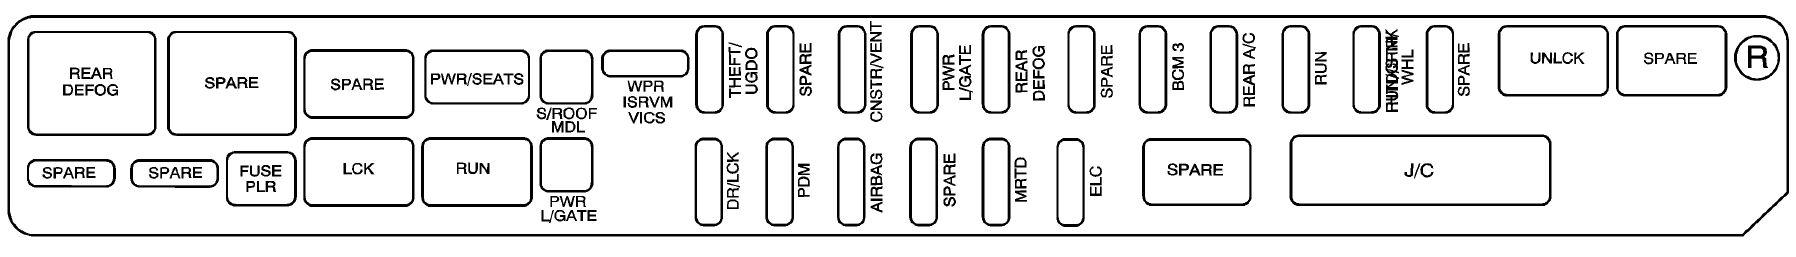 srx fuse box cadillac dts fuse box wiring diagram for car engine